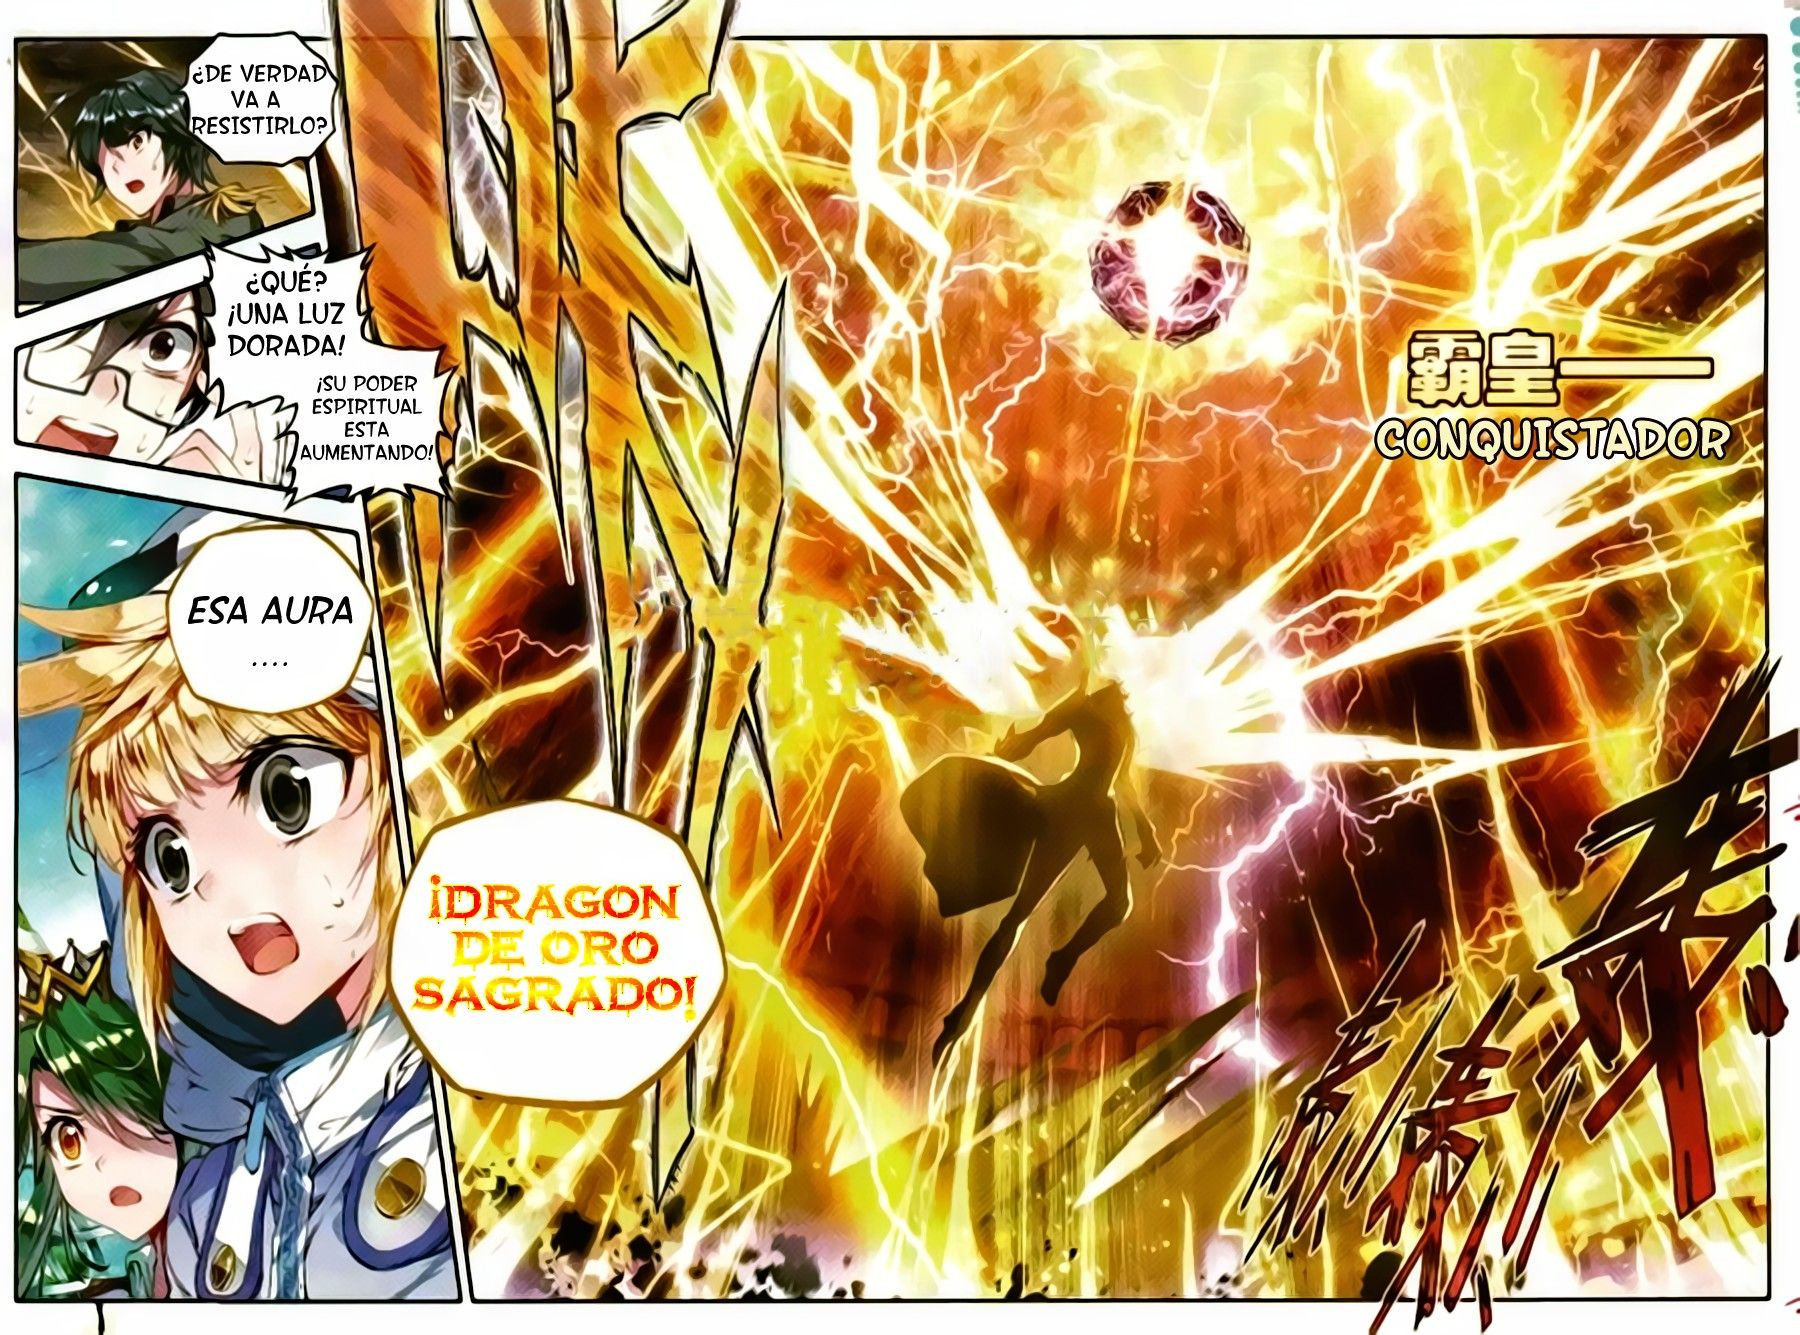 http://c5.ninemanga.com/es_manga/33/16417/476183/4ee2d89692c2bacd9594237bae95a259.jpg Page 6